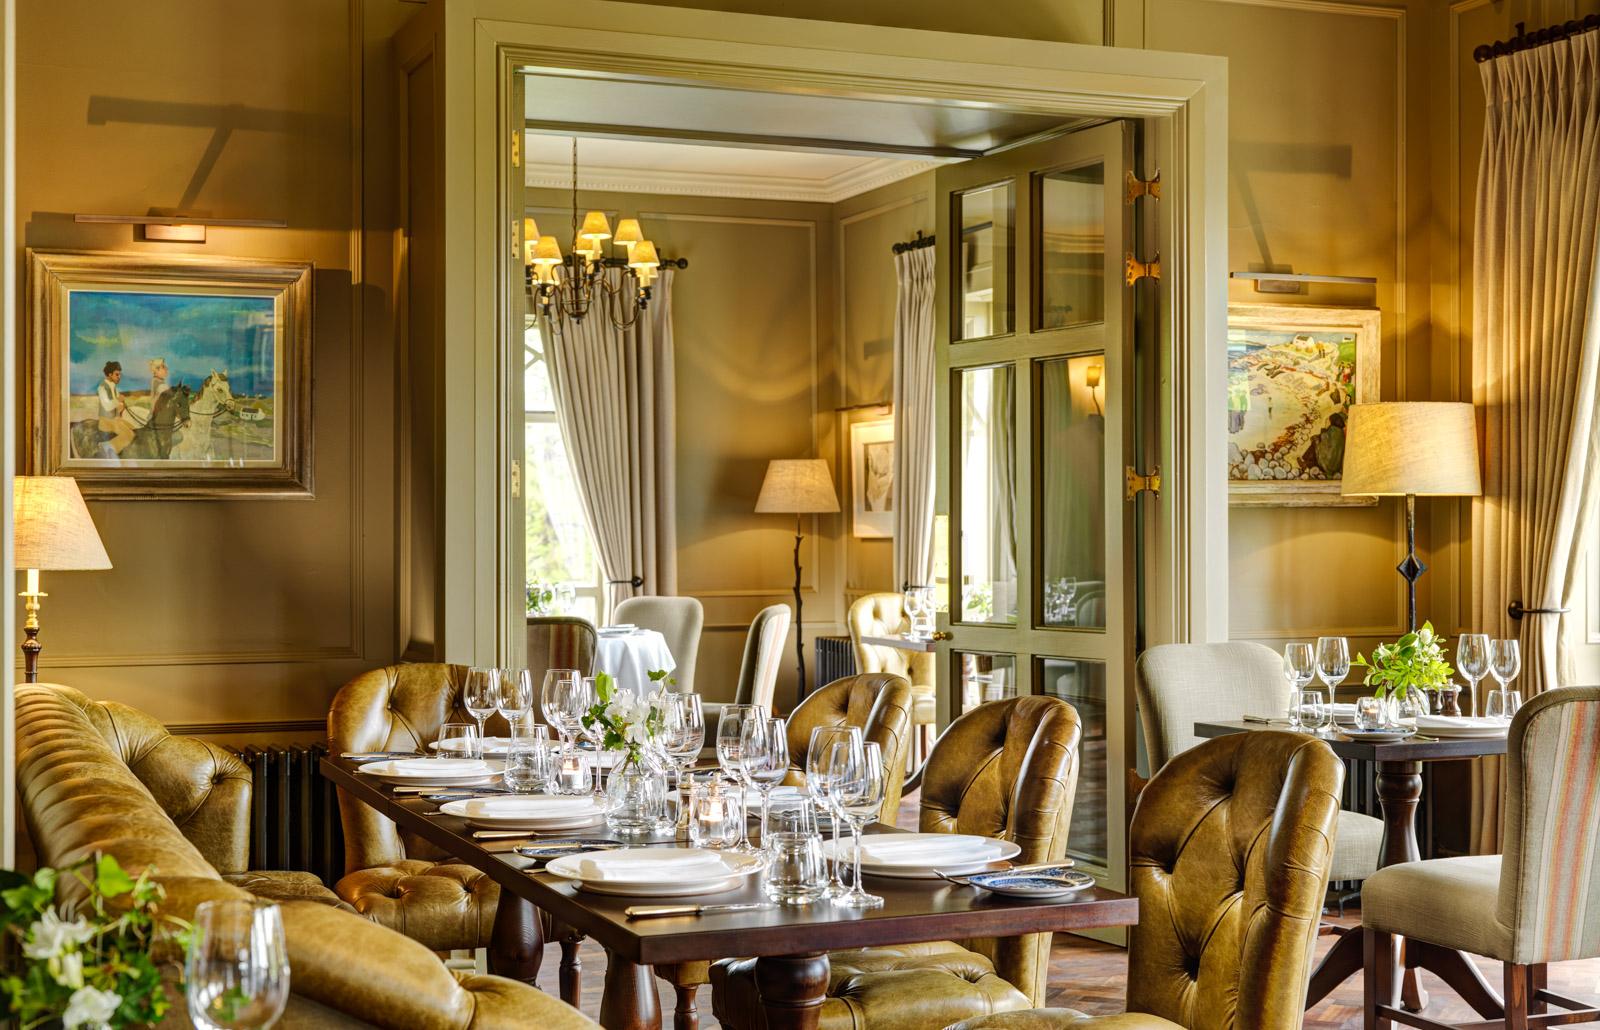 Ballynahinch Restaurant 2 1600px.jpg